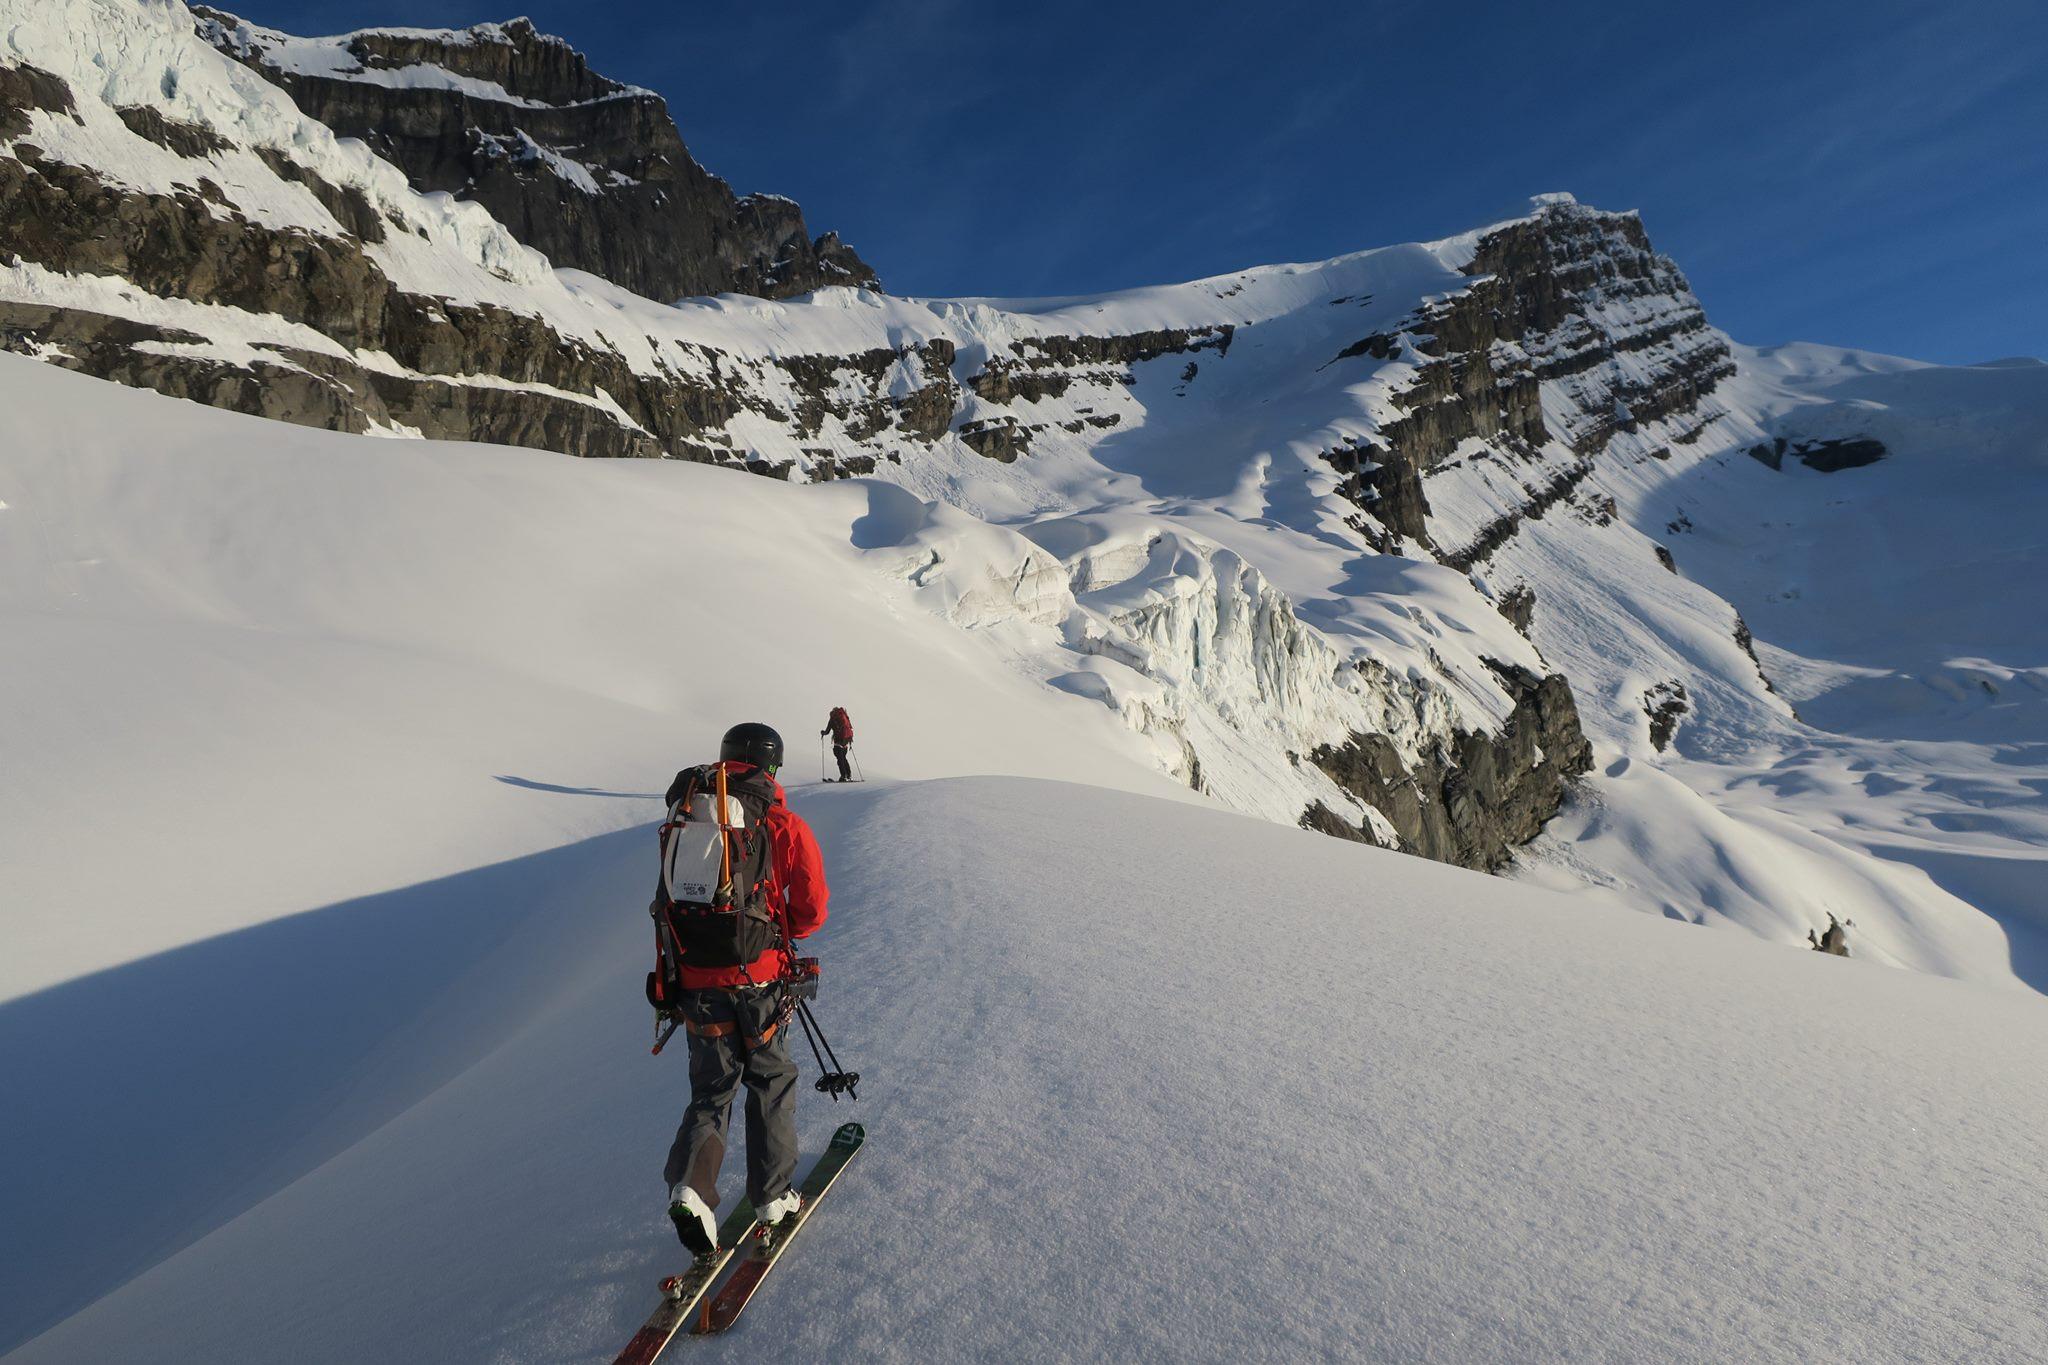 Approaching Whitehorn Mountain. McNab photo